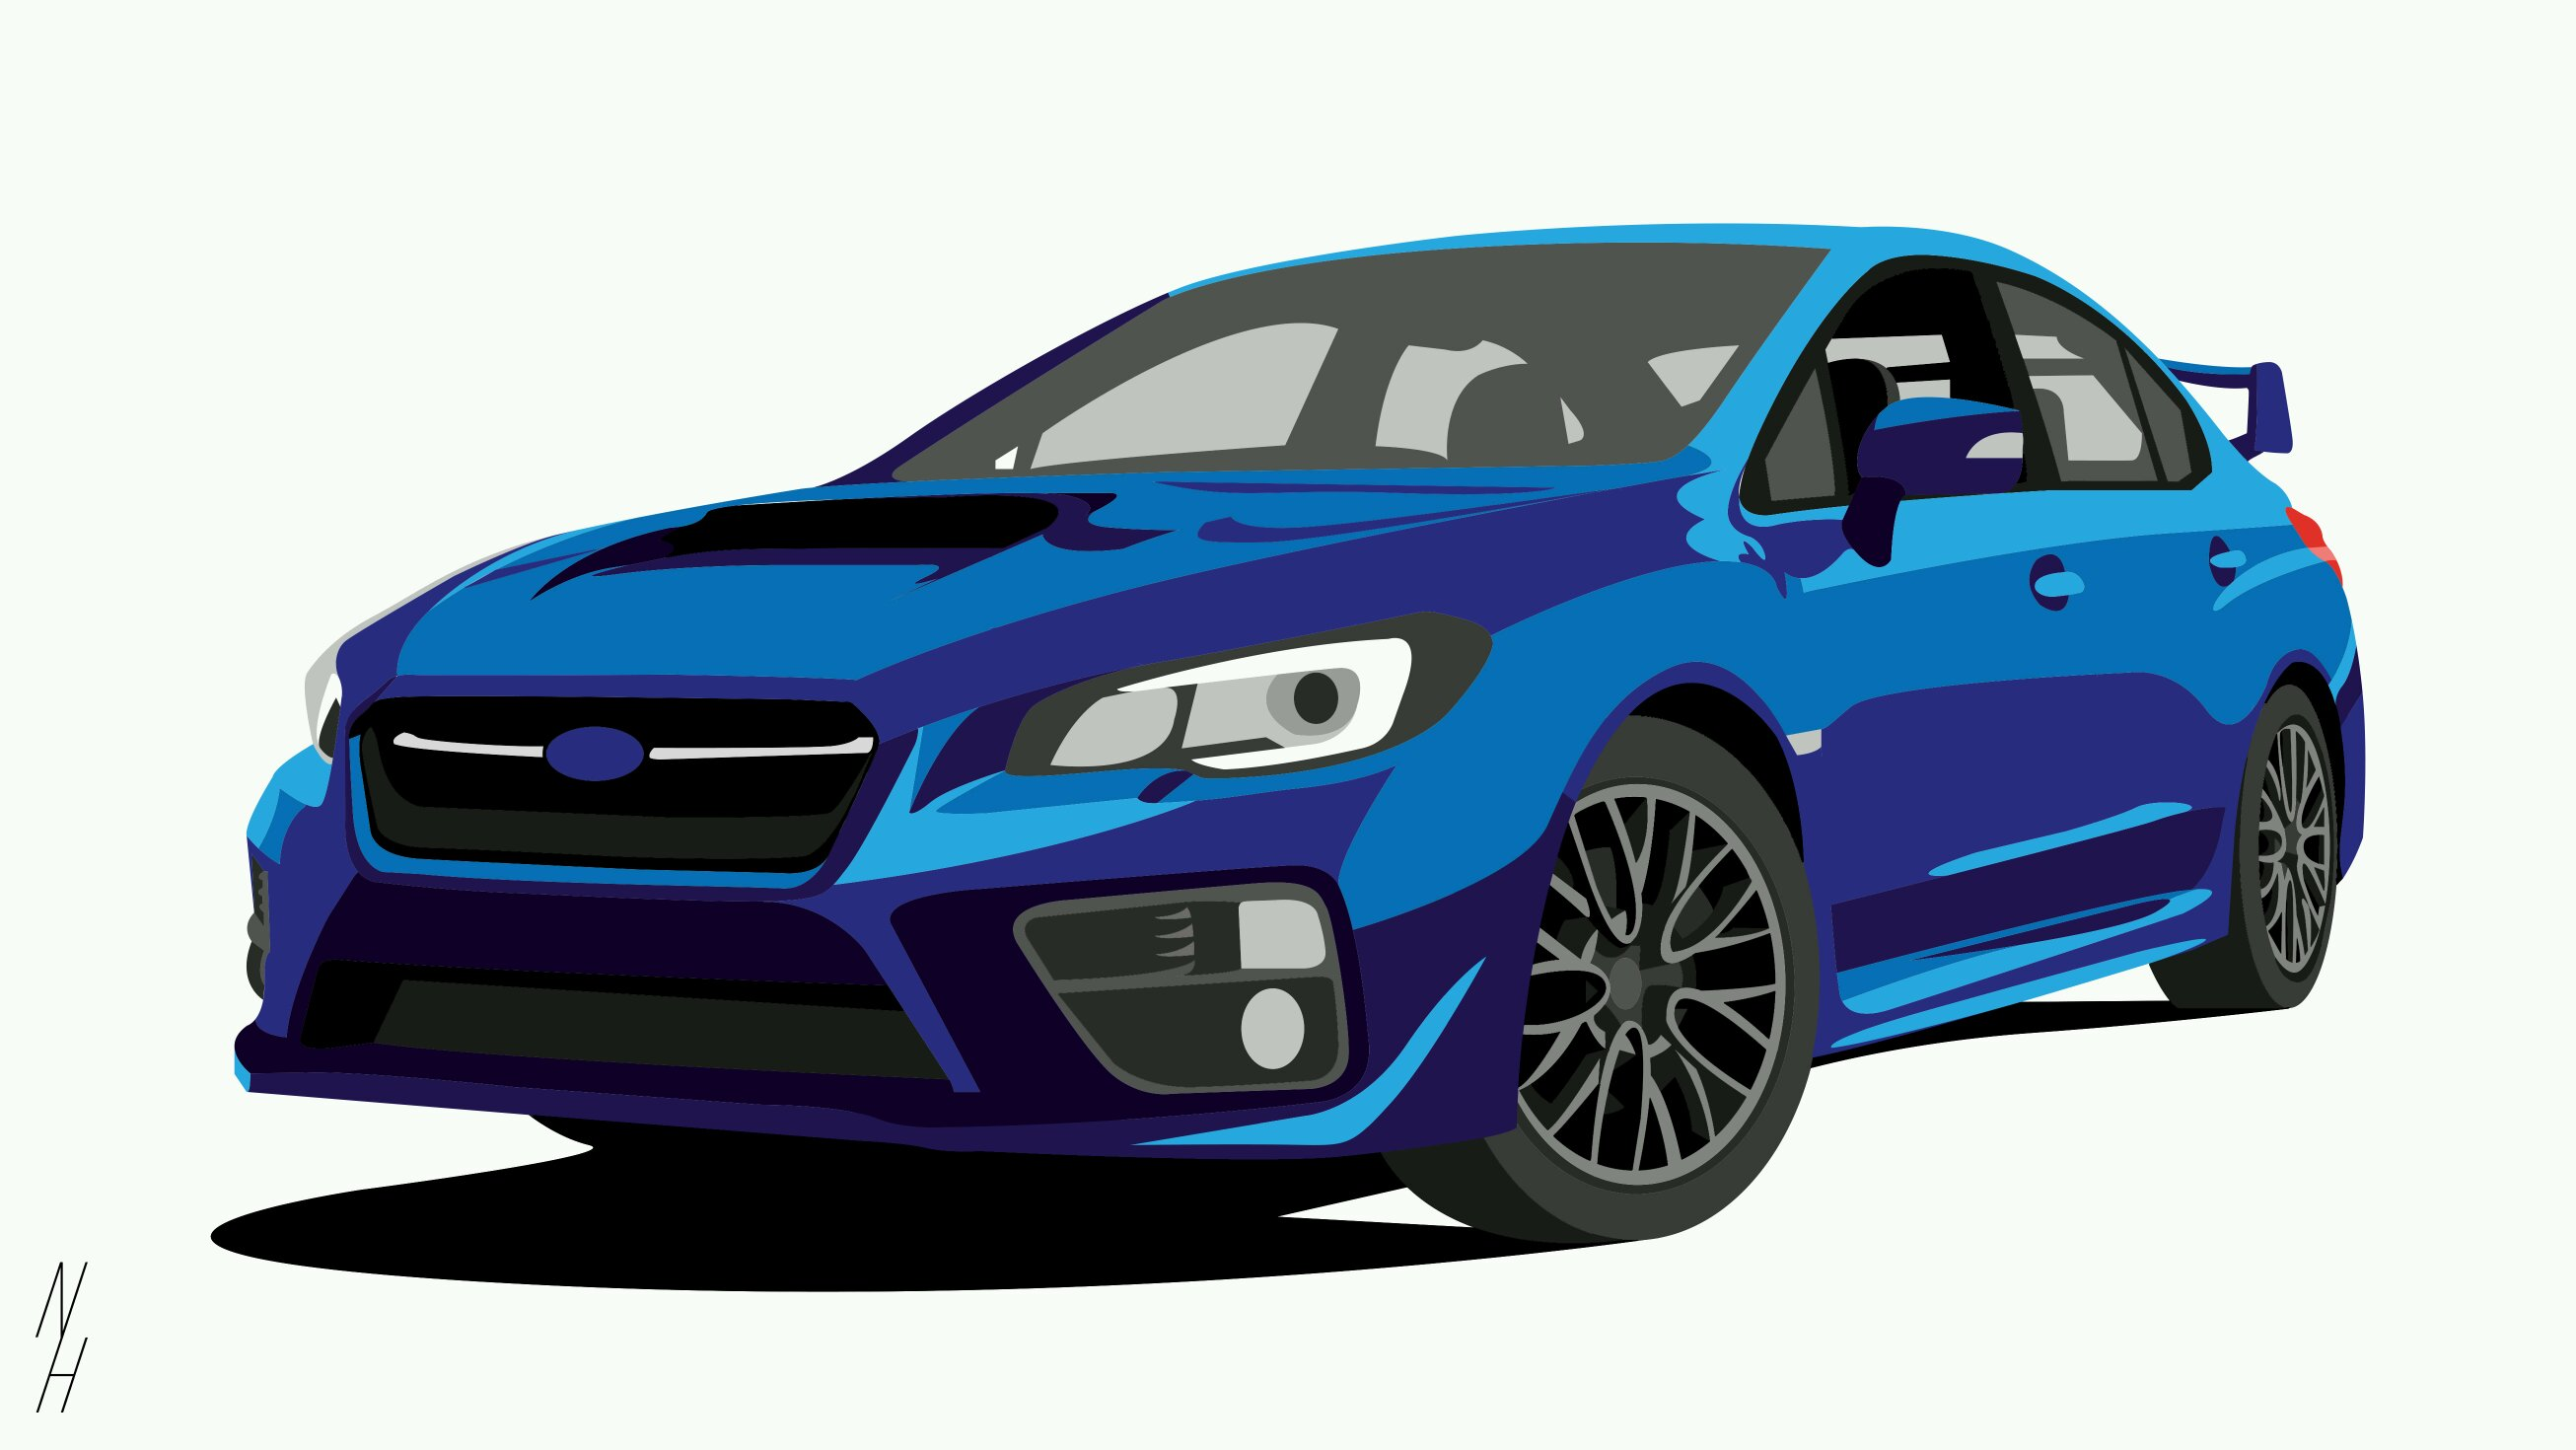 Subaru subaru impreza wrx sti illustration made by me car art